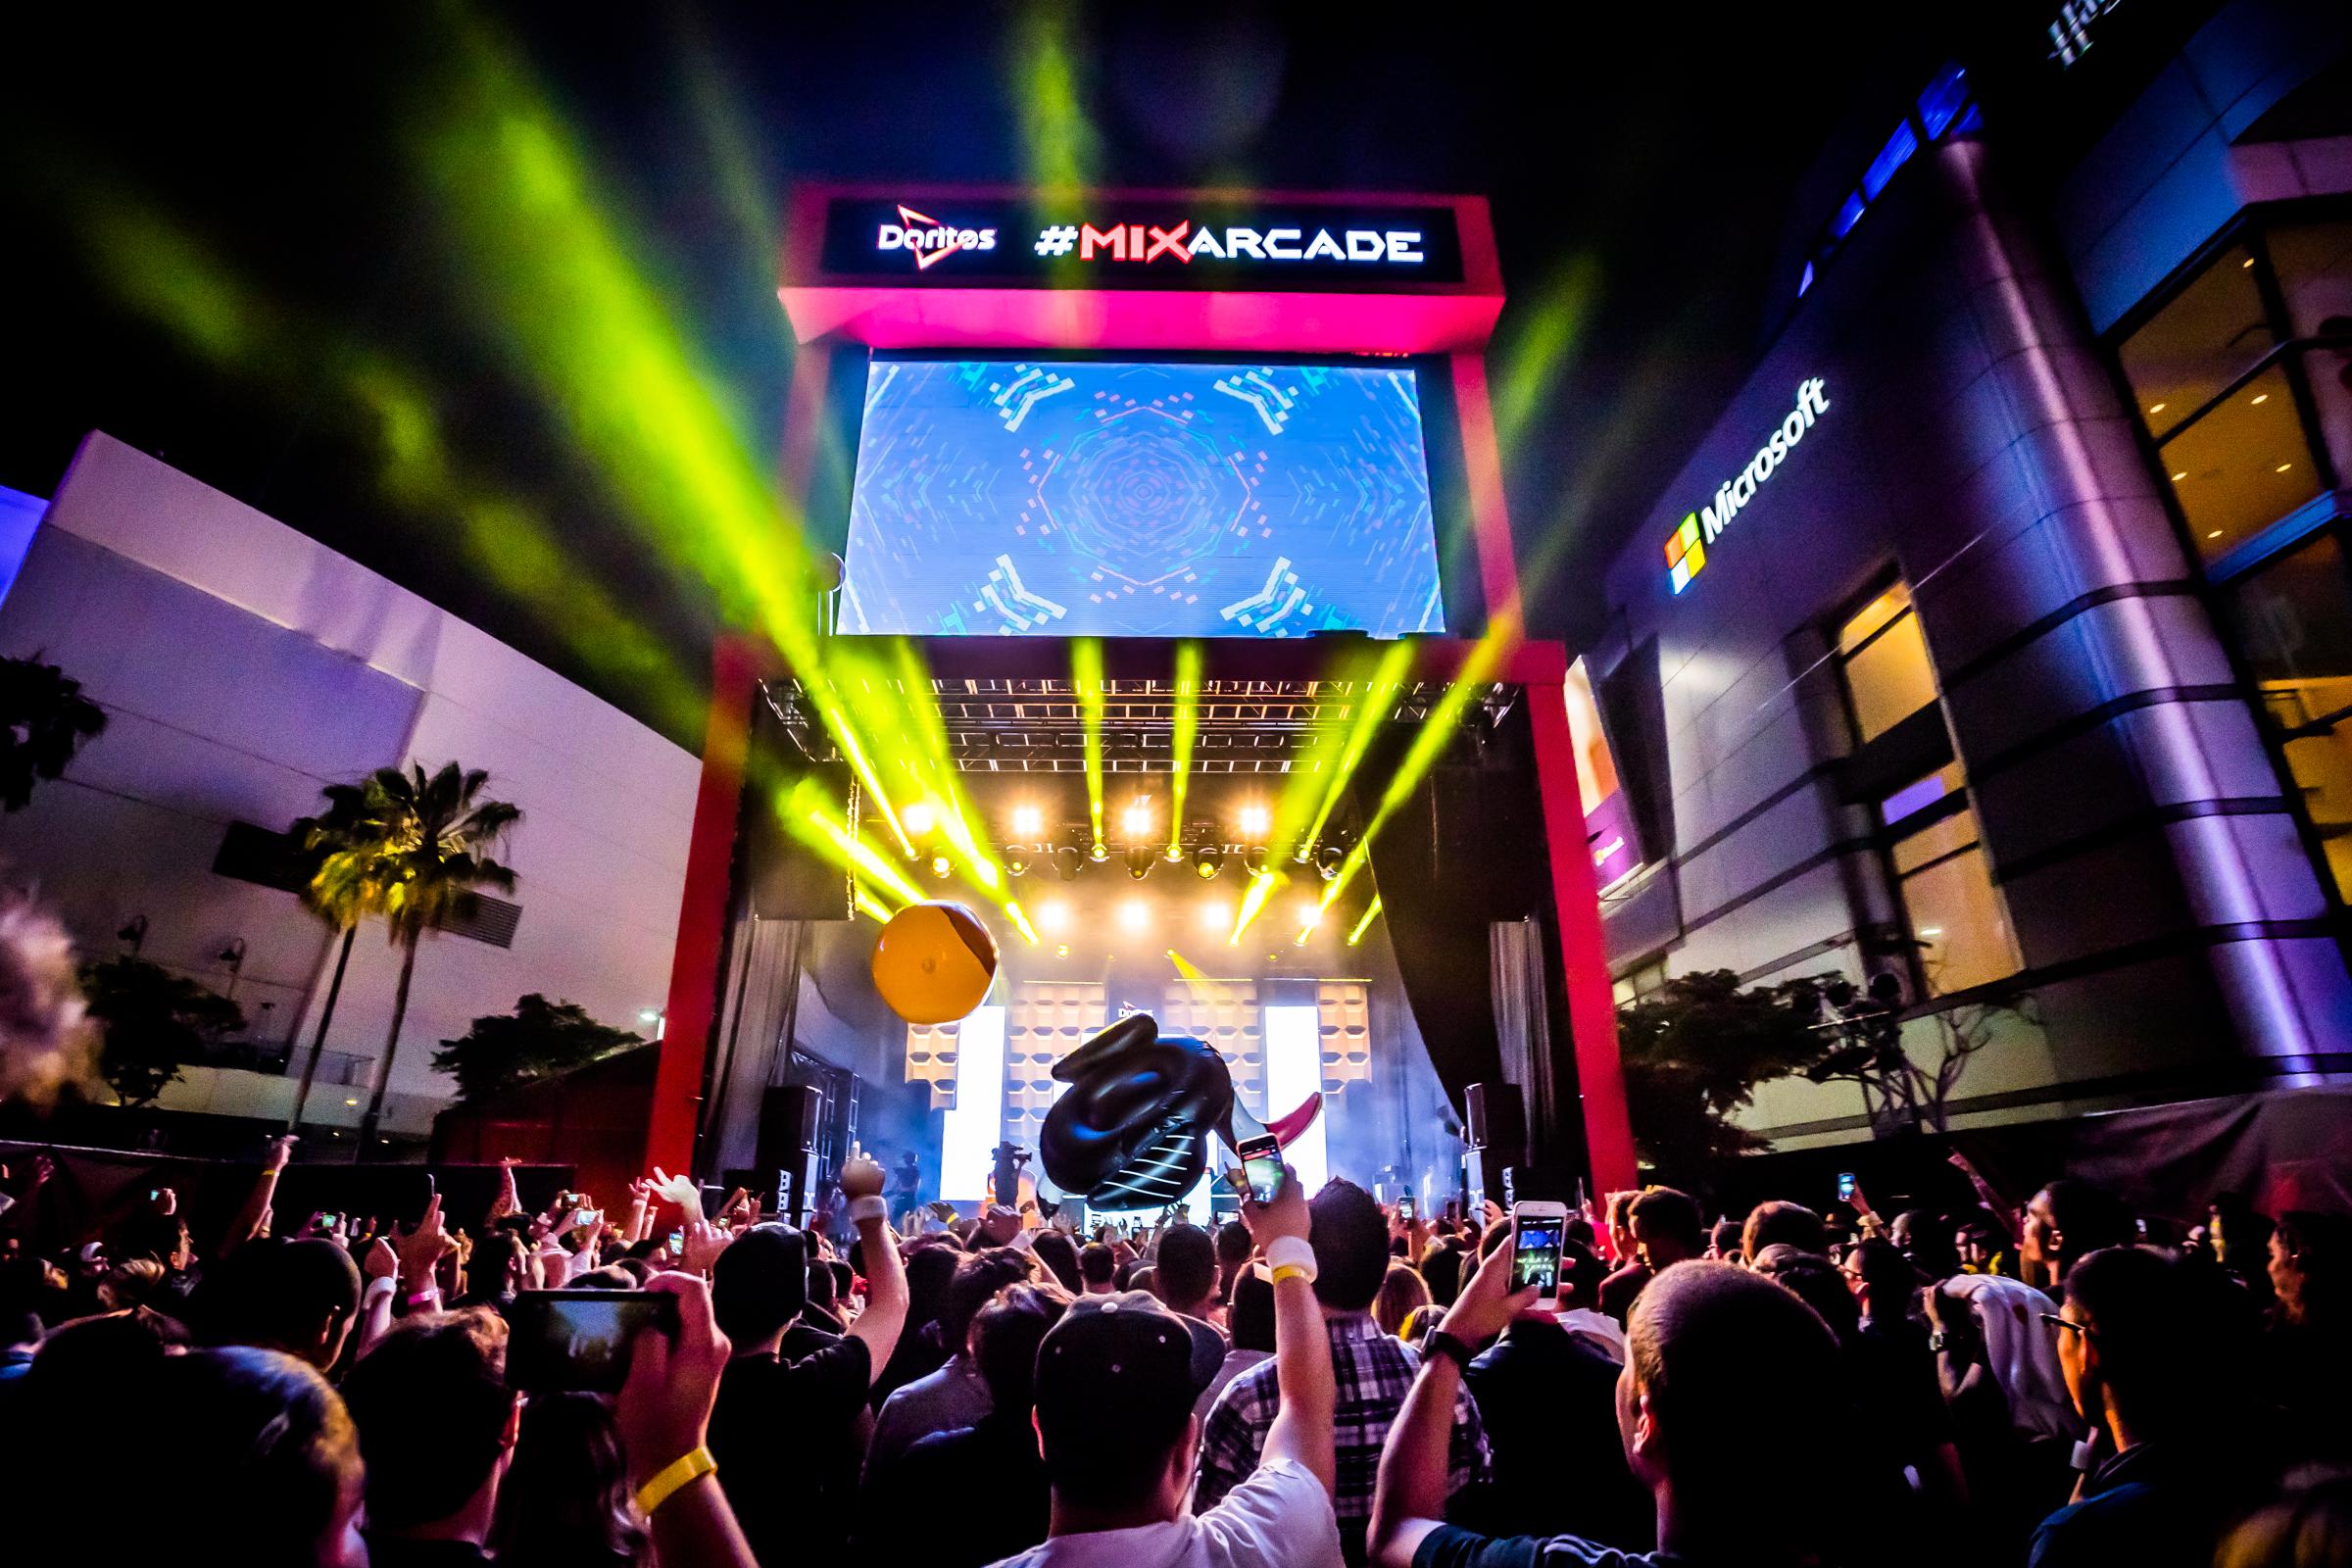 Doritos #MixArcade Staples Center 2016.Los Angeles